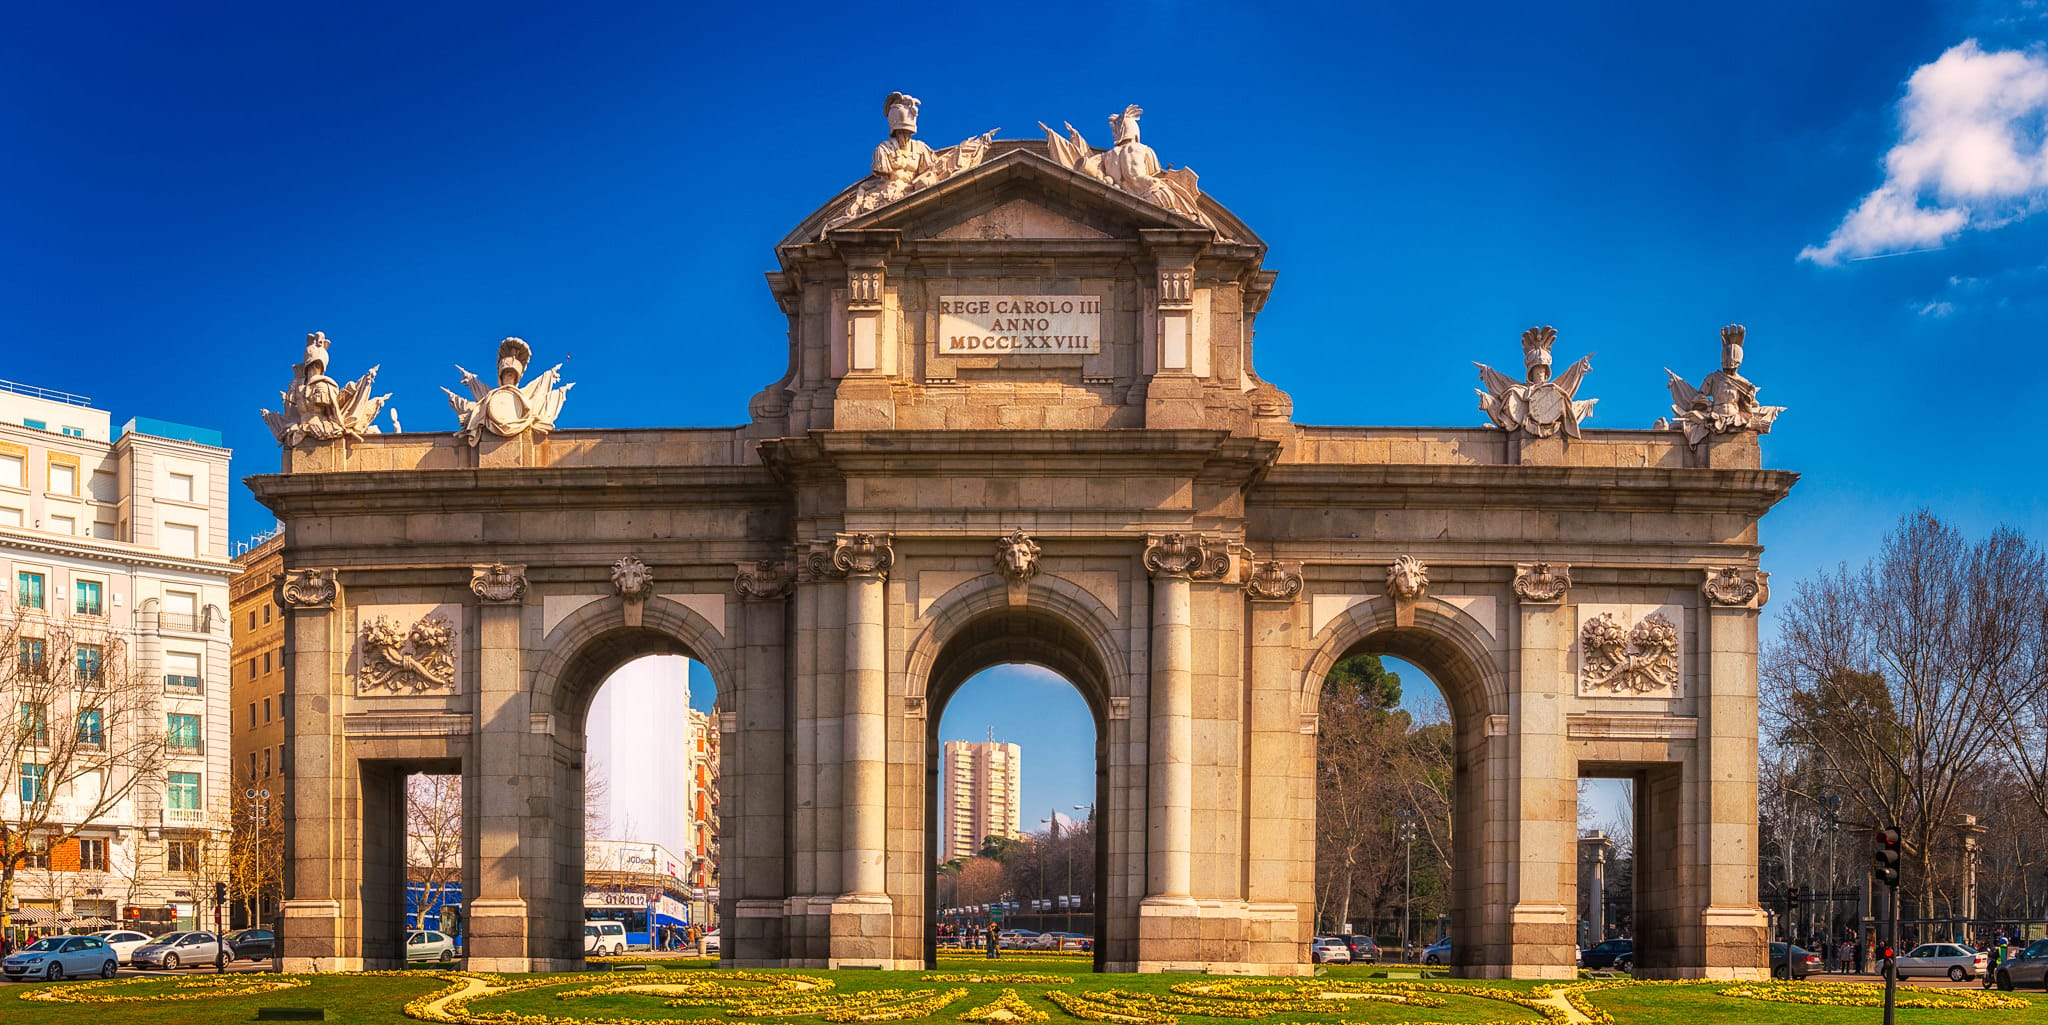 Puerta de Alcalá | Madryt, Hiszpania